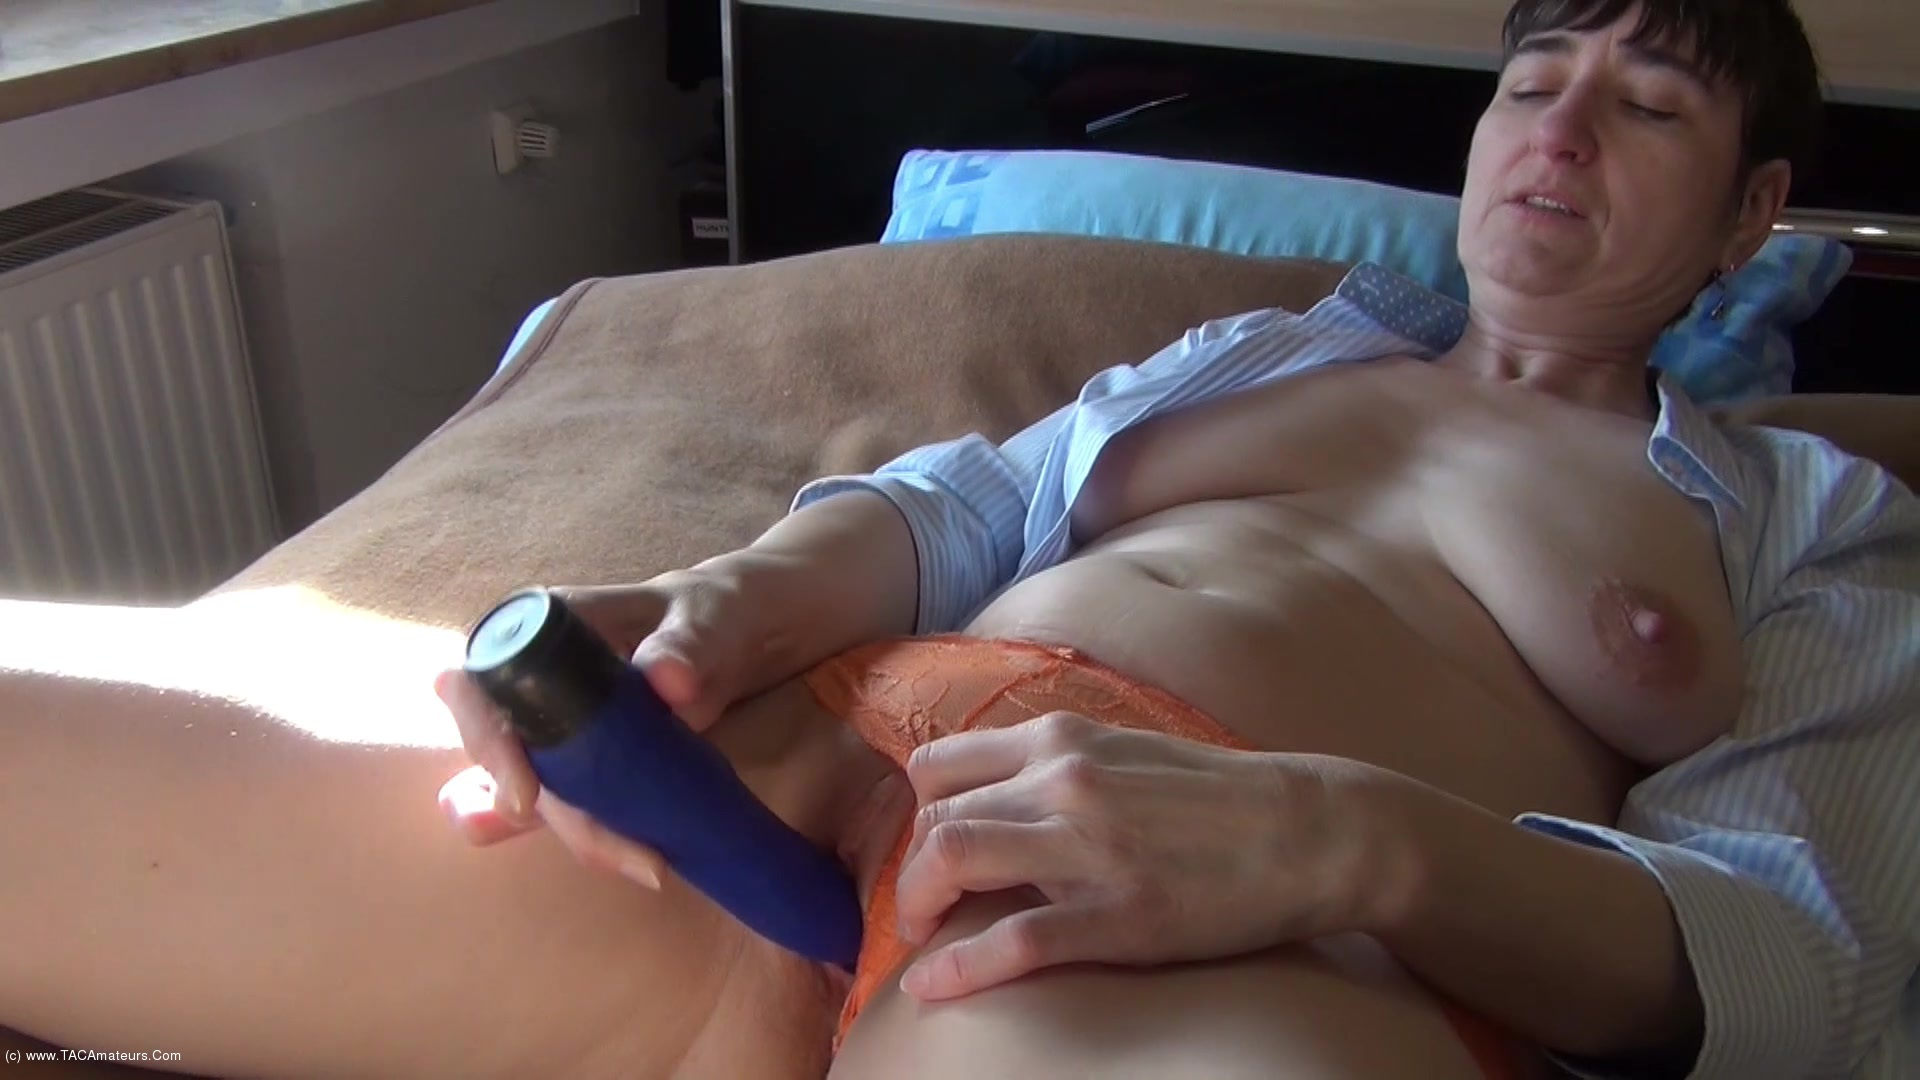 HotMilf - New Vibrator & Panties scene 2